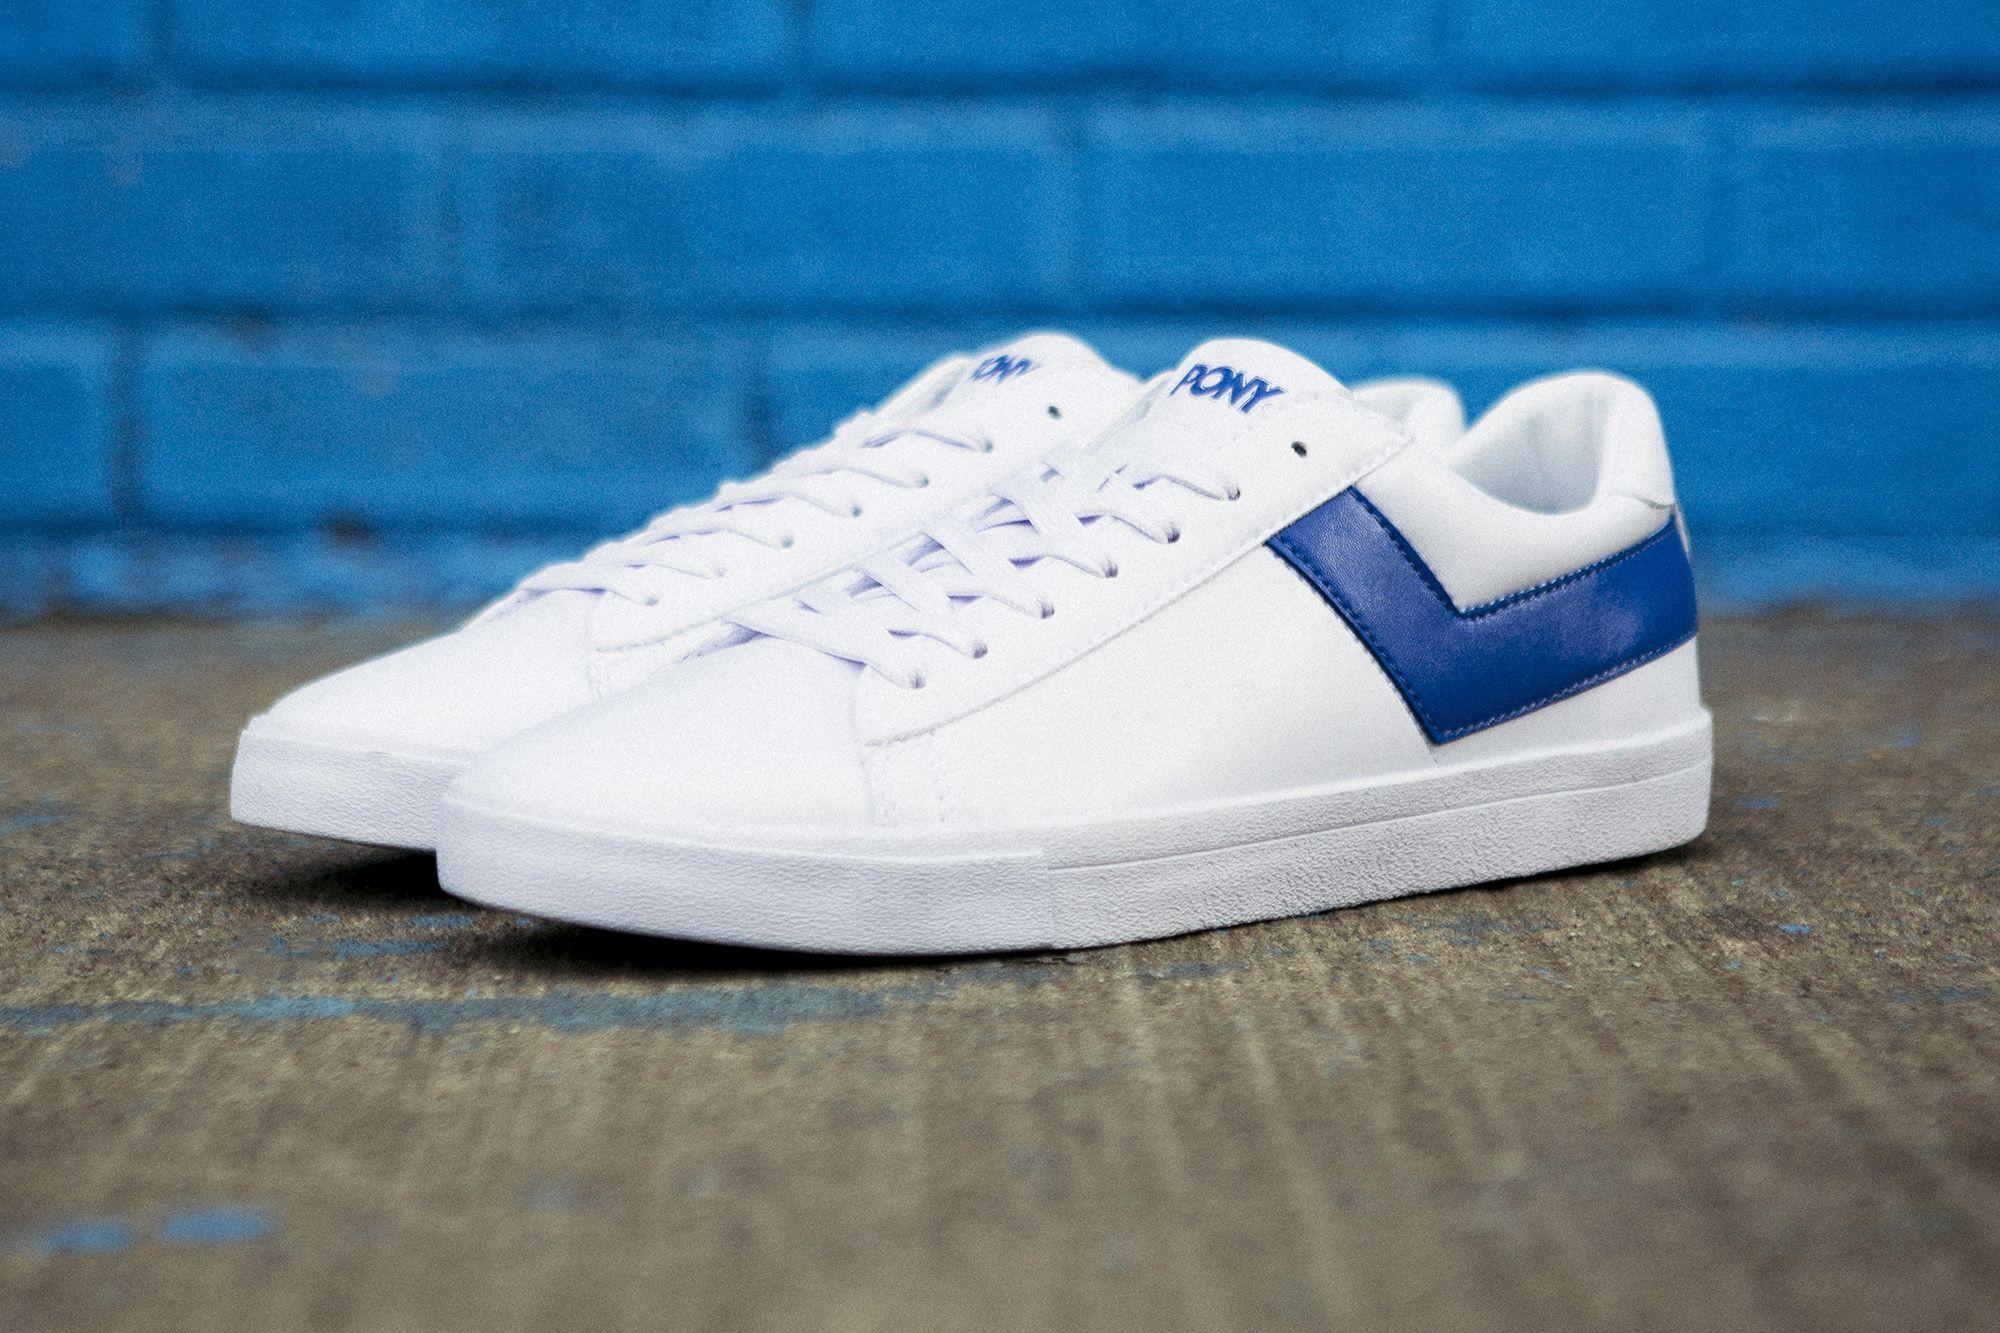 Joey BadAss Models PONY's New Sneakers